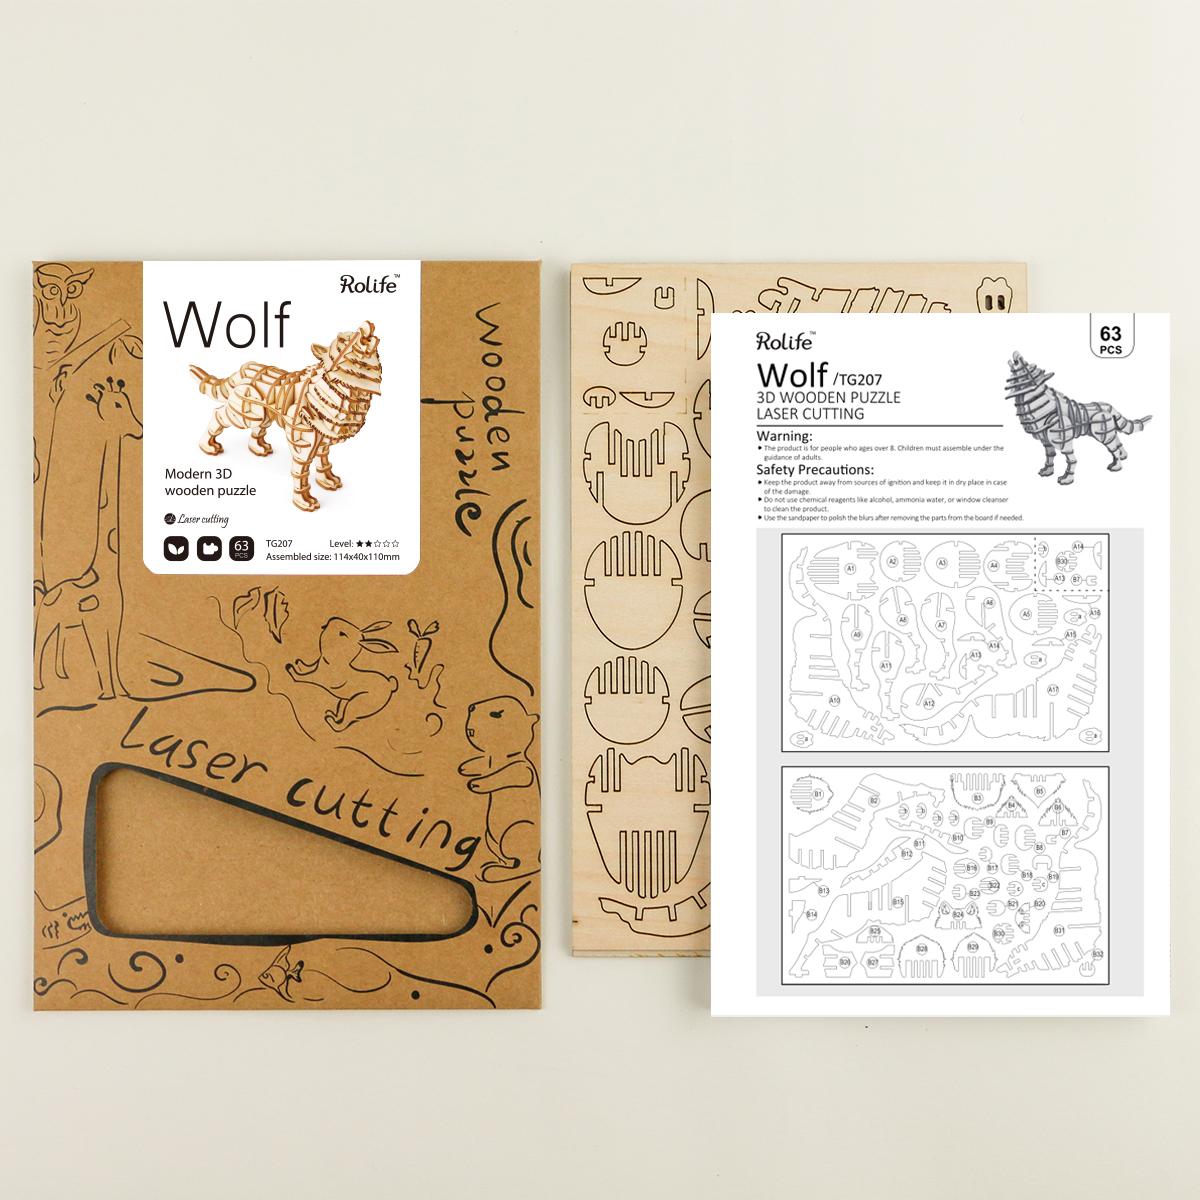 Wolf TG207